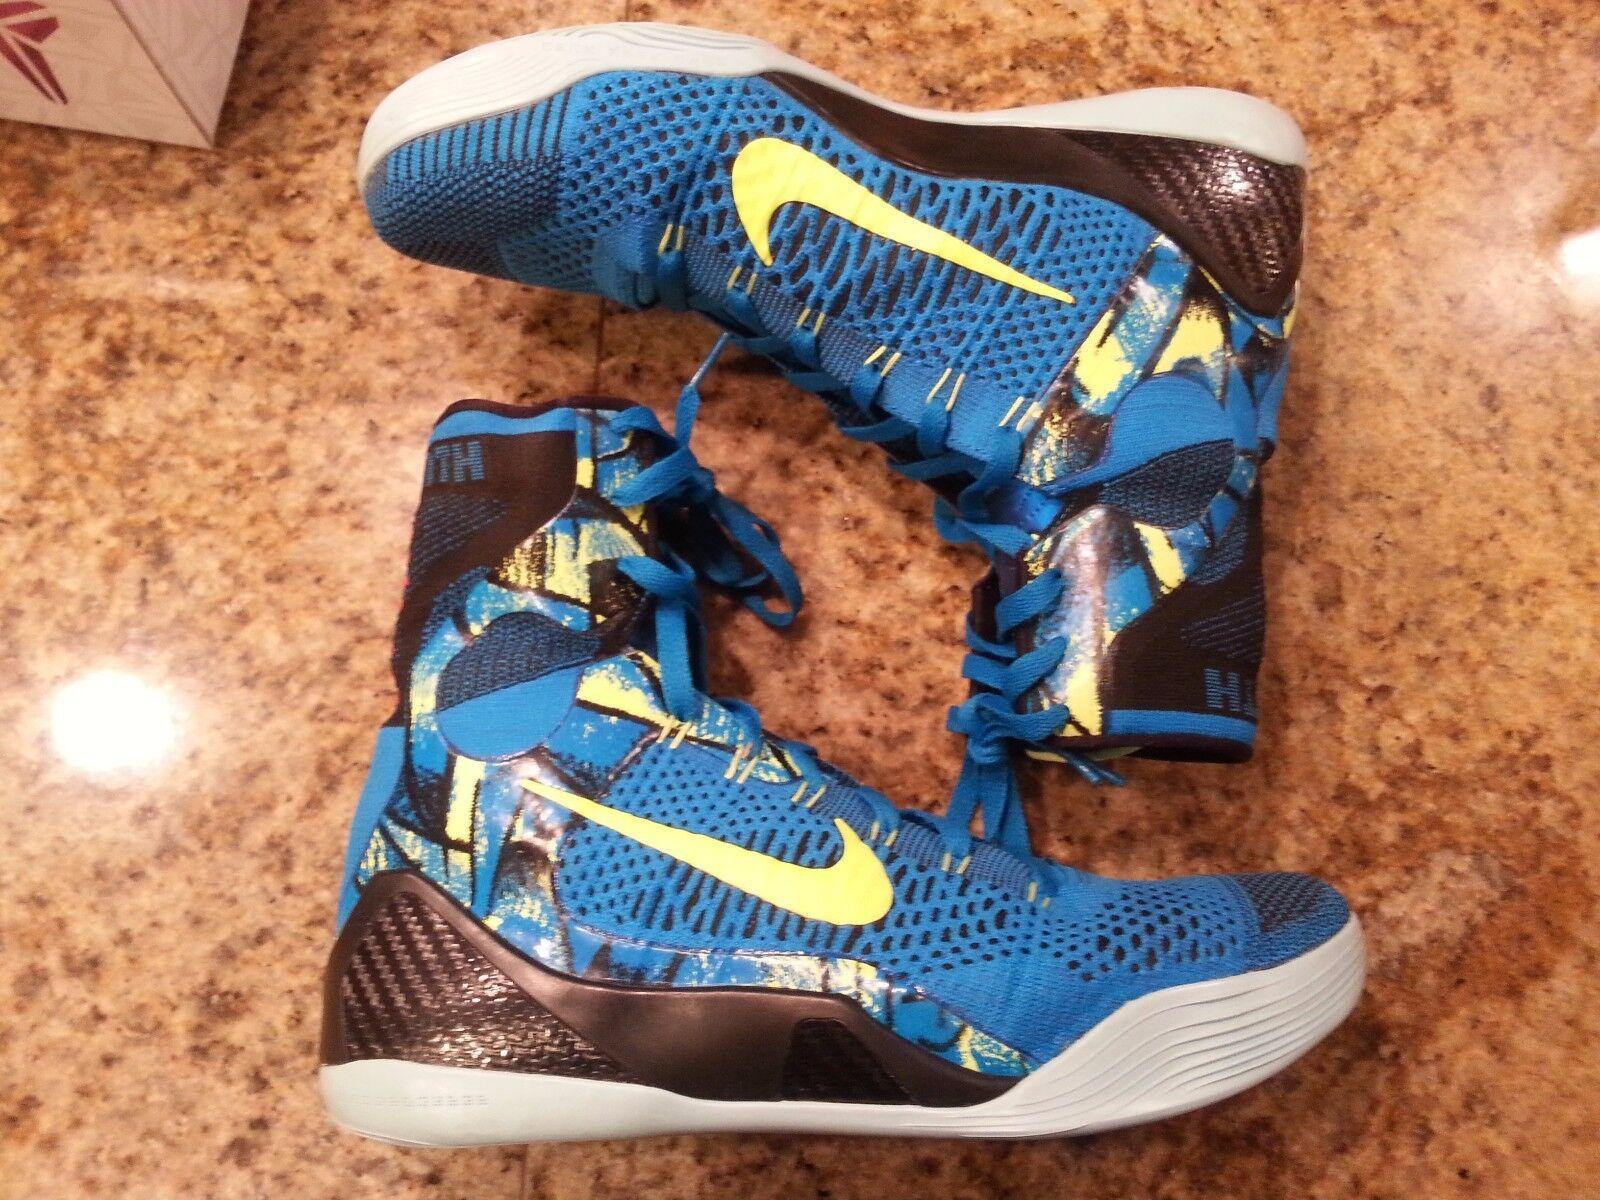 Nike kobe 9 ix elite prospettiva blu dimensioni 630847-400 jordan beethoven bhm